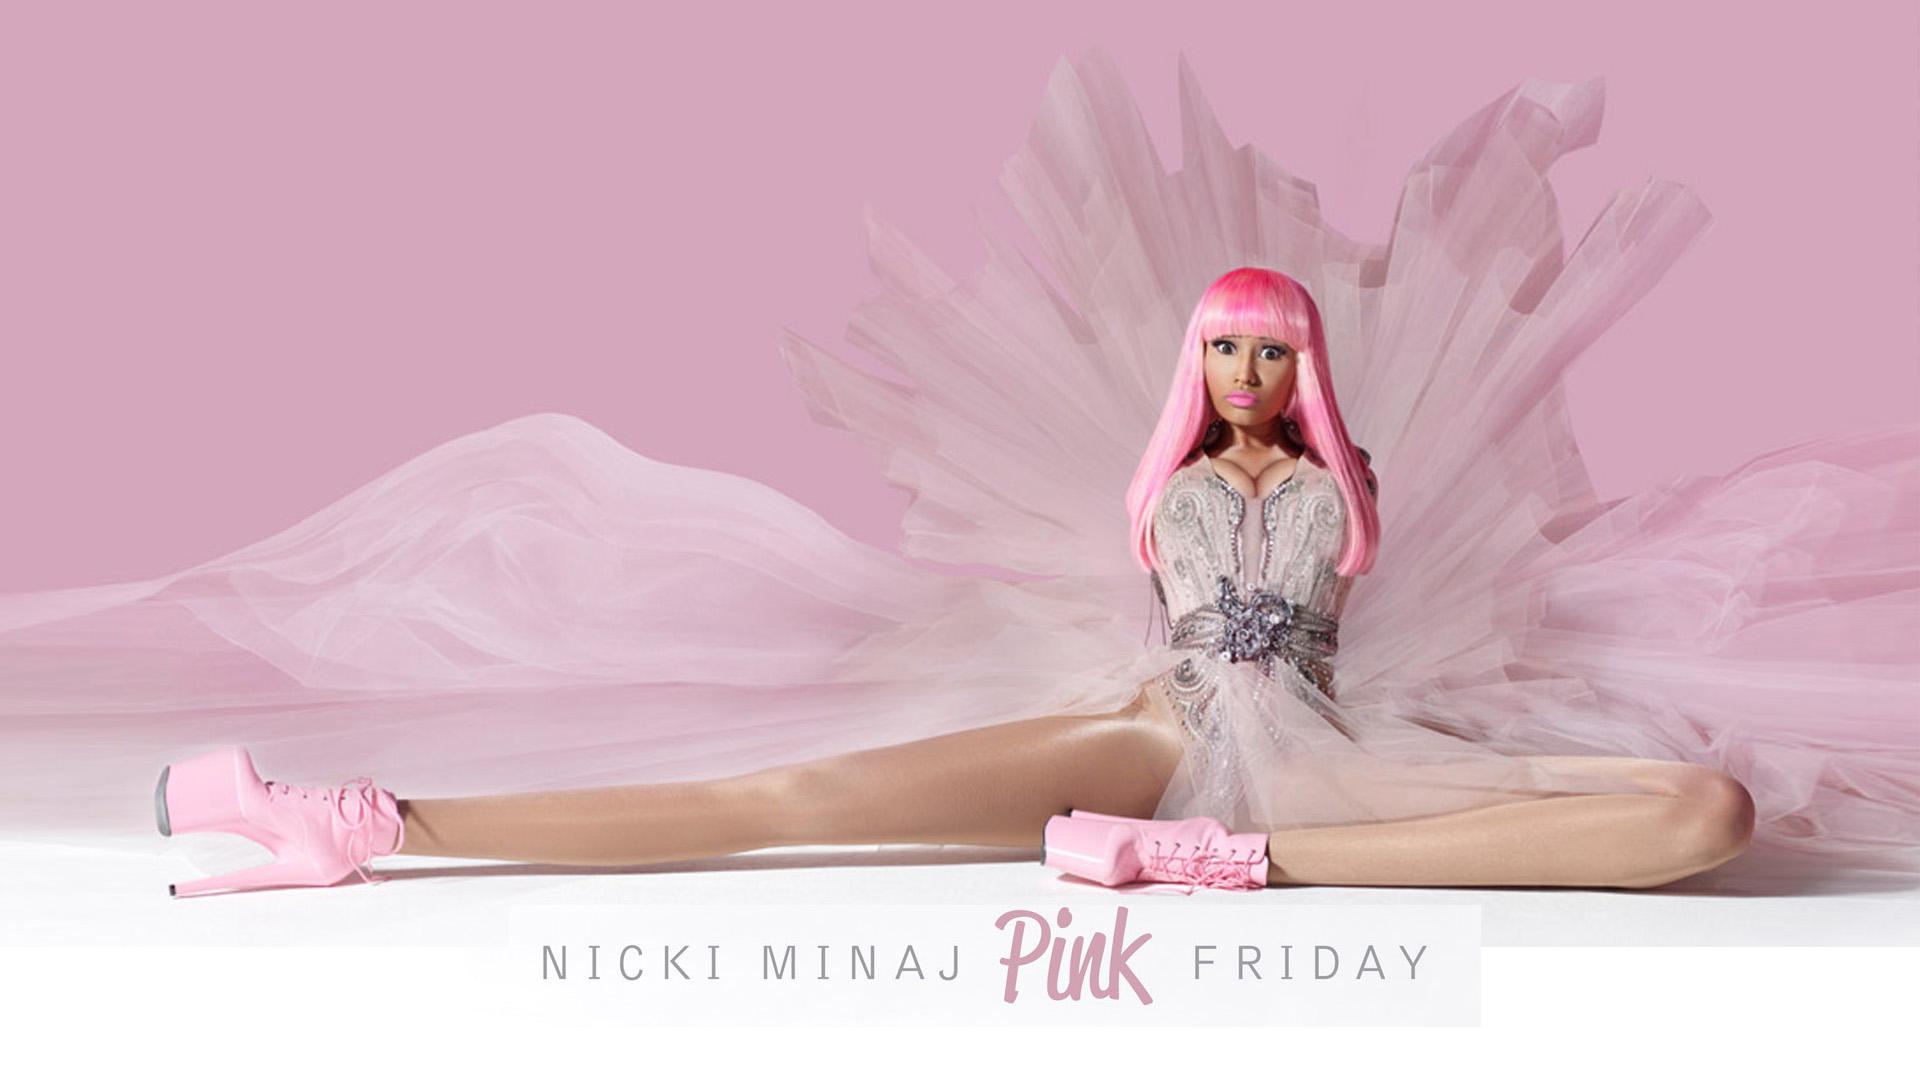 Nicki Minaj Google Skins Nicki Minaj Google Backgrounds Nicki Minaj 1920x1080